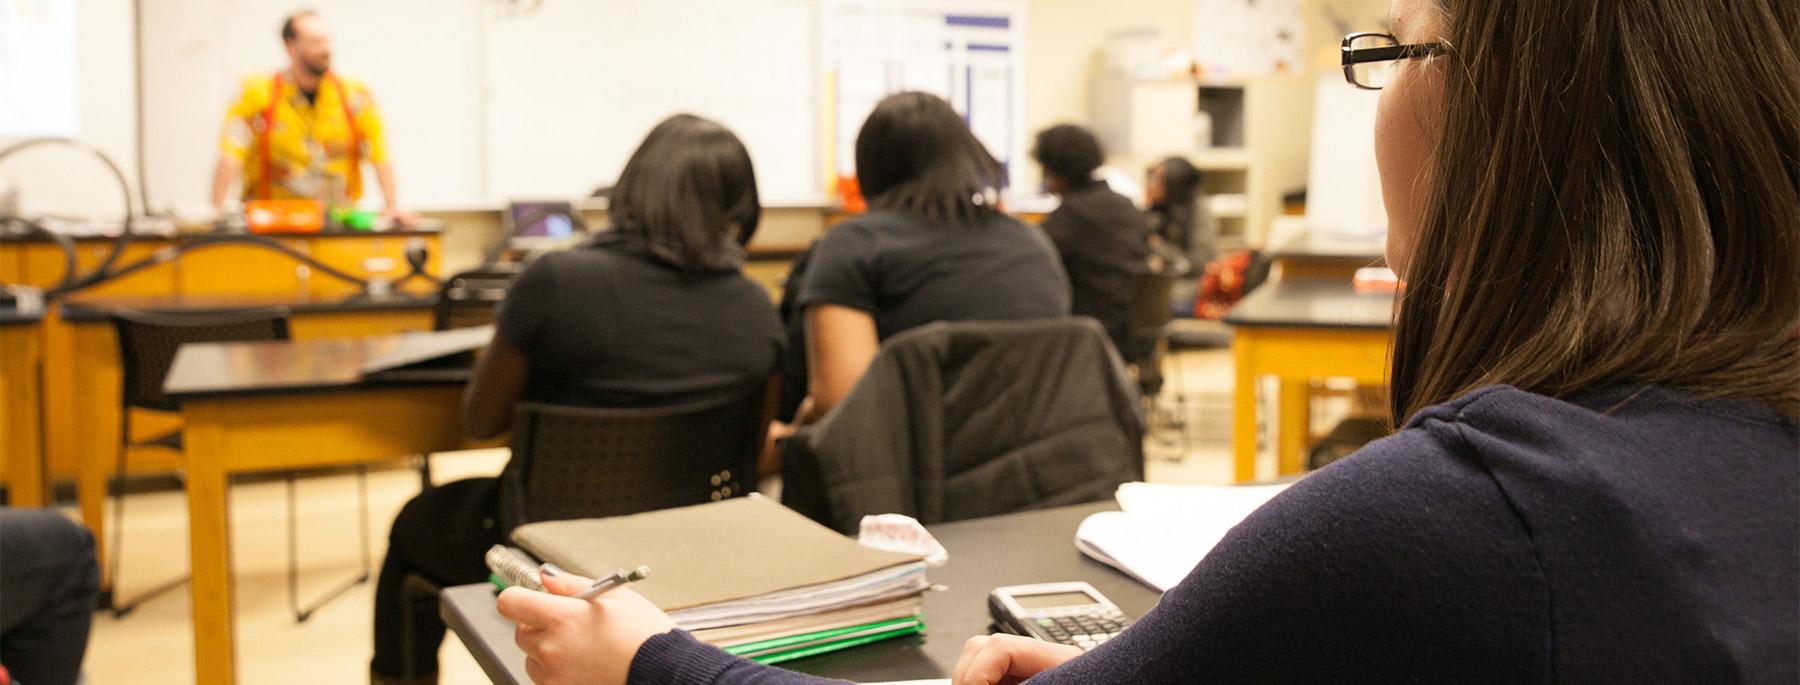 Indianapolis Metropolitan High School Classroom